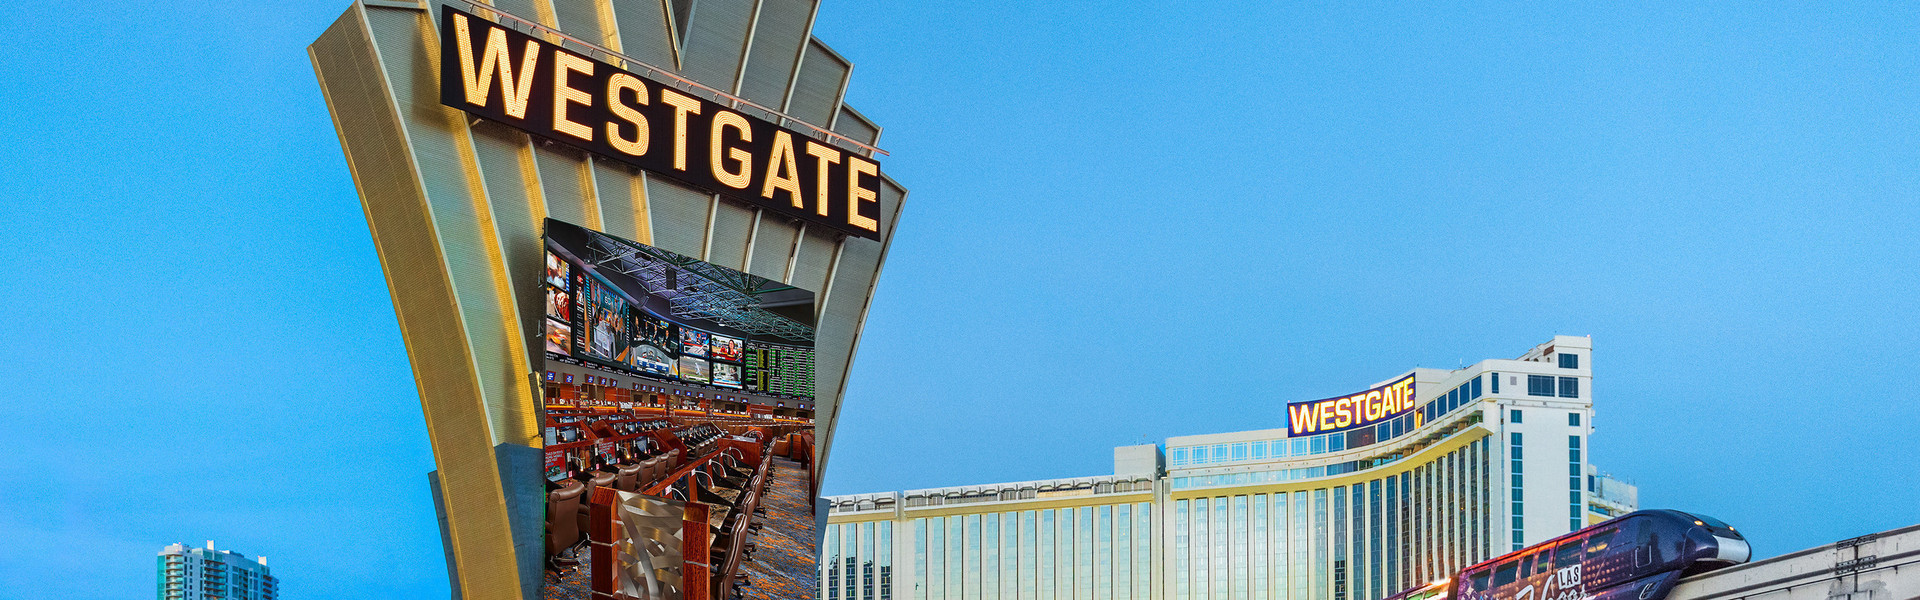 Las Vegas Monorail near our Las Vegas Hotel and Casino | Las Vegas Monorail at Westgate Las Vegas